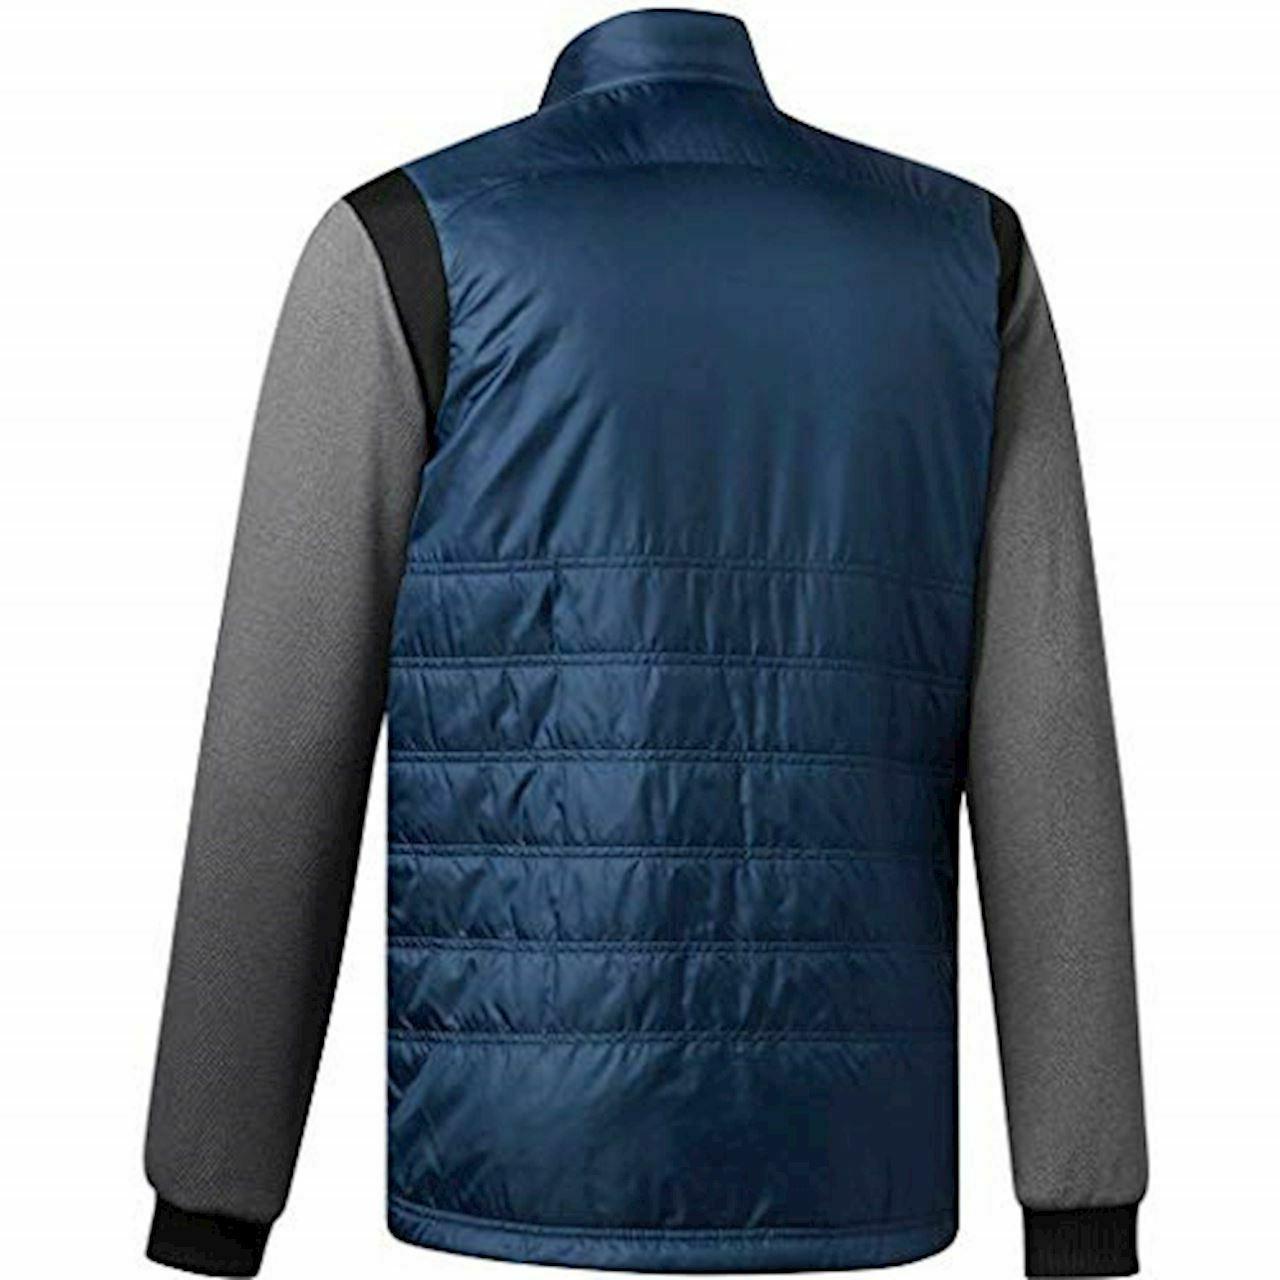 NWT ADIDAS Men Climaheat Frostguard Jacket Navy $180